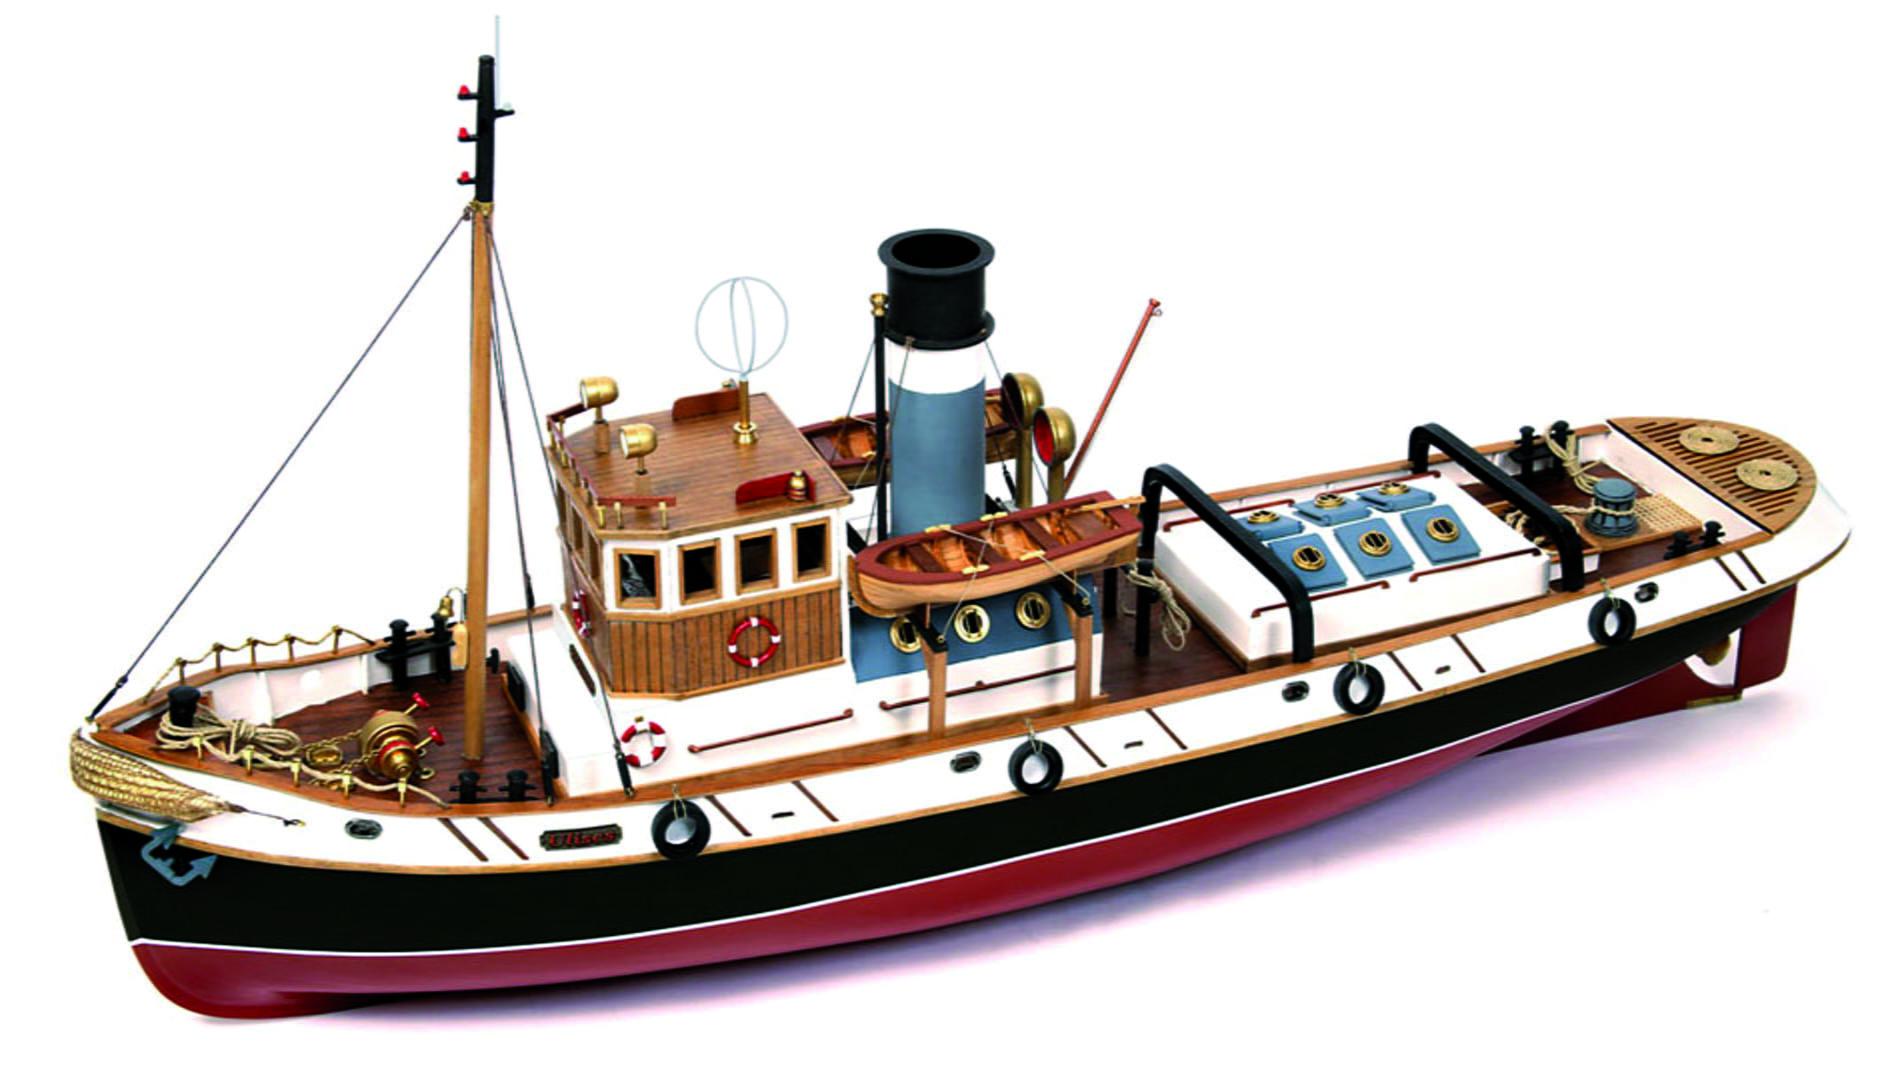 Boat Kits Product : Occre ulises tug scale model rc wood metal boat kit